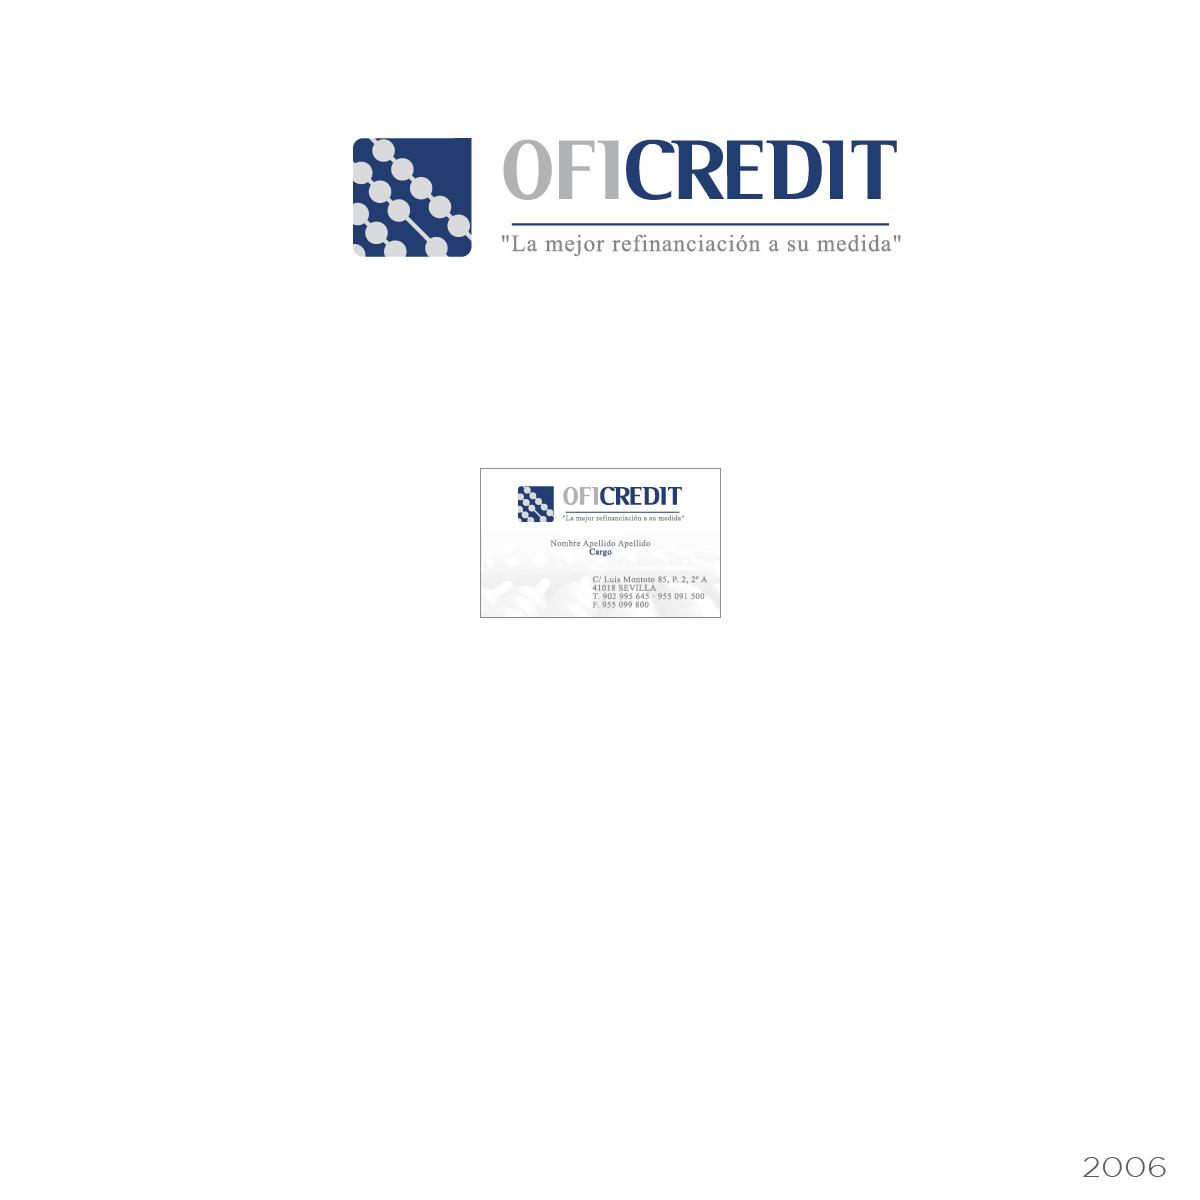 Logotipo Empresa Crédito